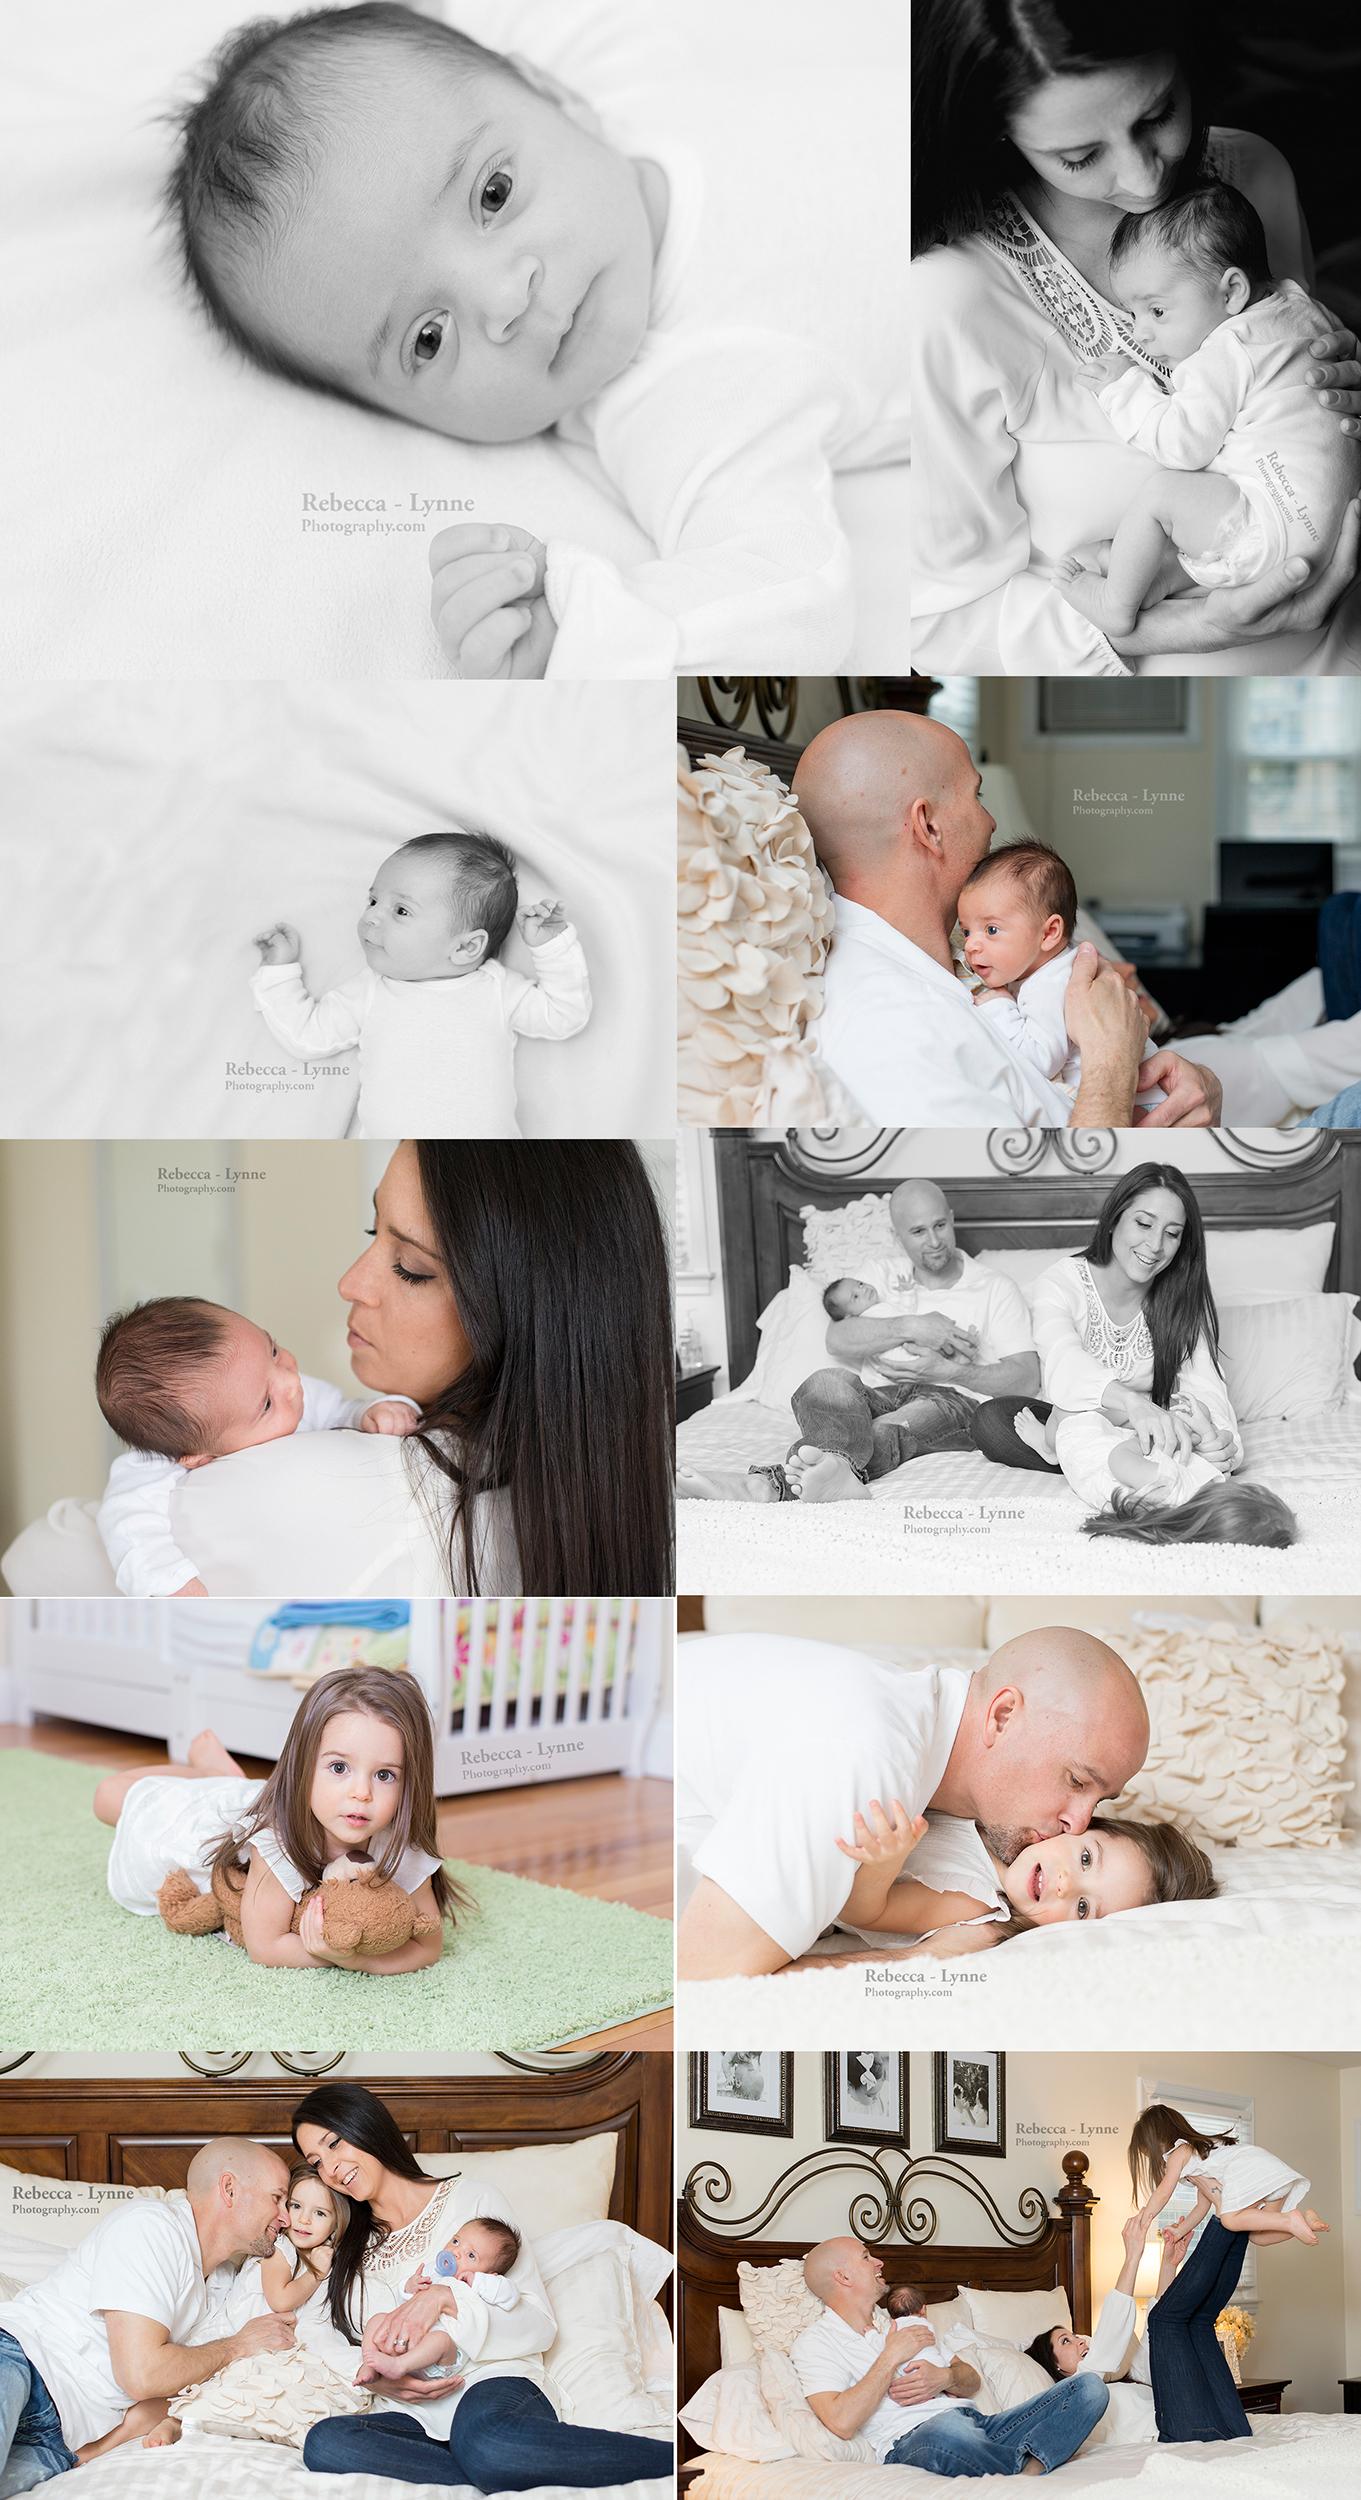 ct newborn photography. connecticut newborn photographer